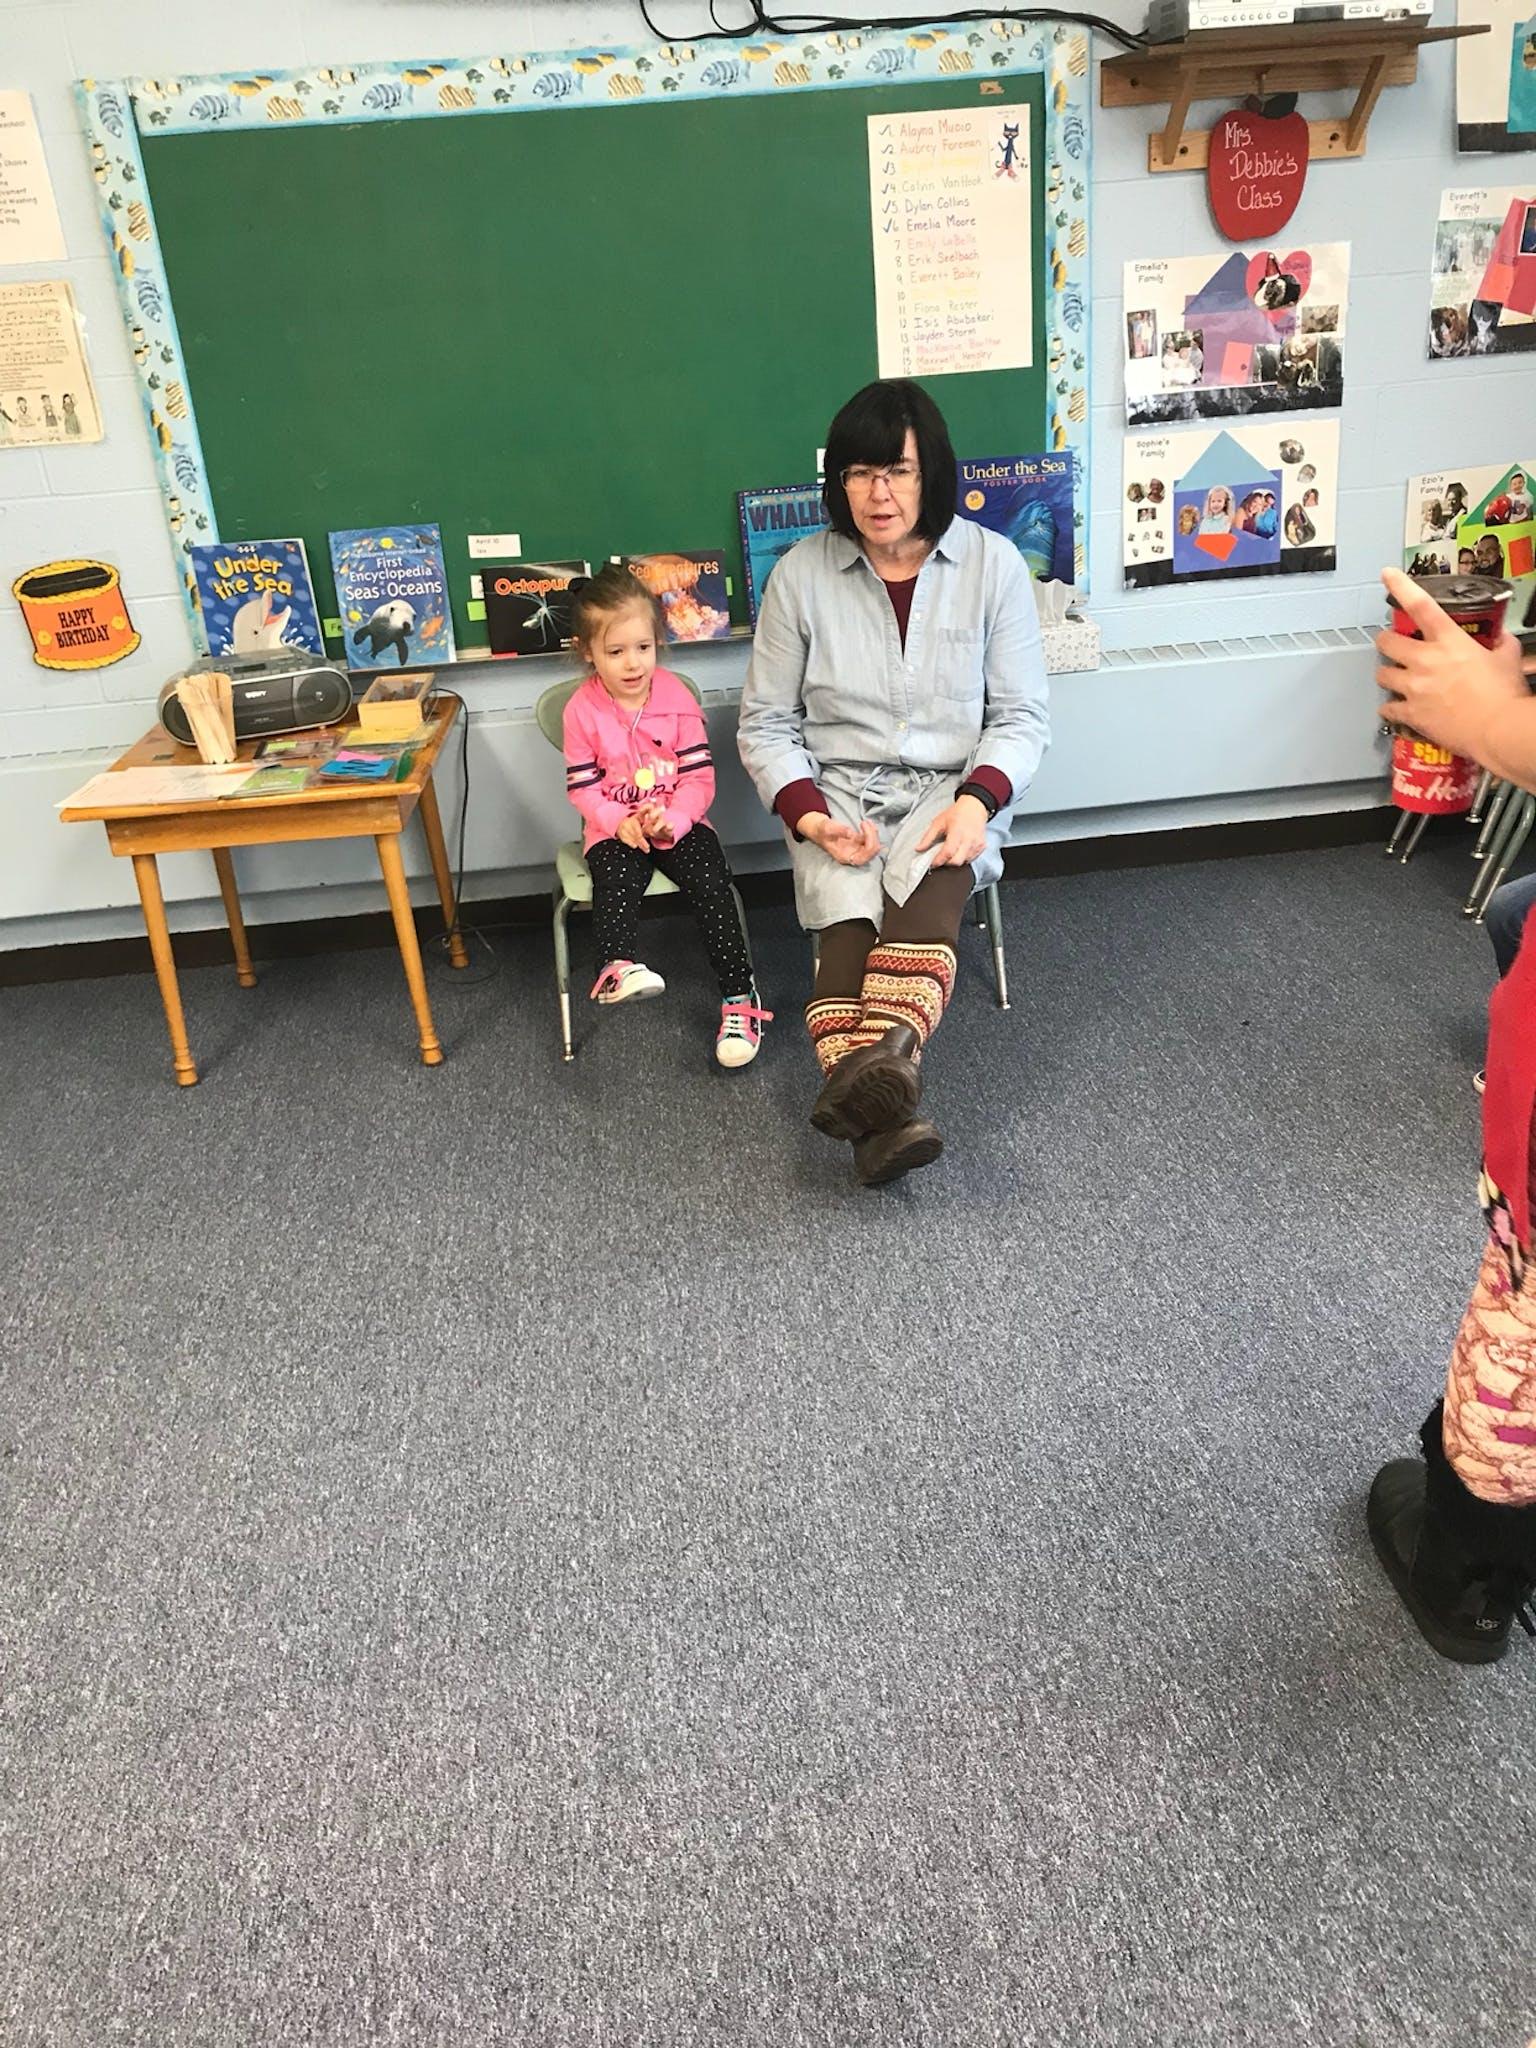 Garden City Cooperative Preschool Inc in Garden City, MI